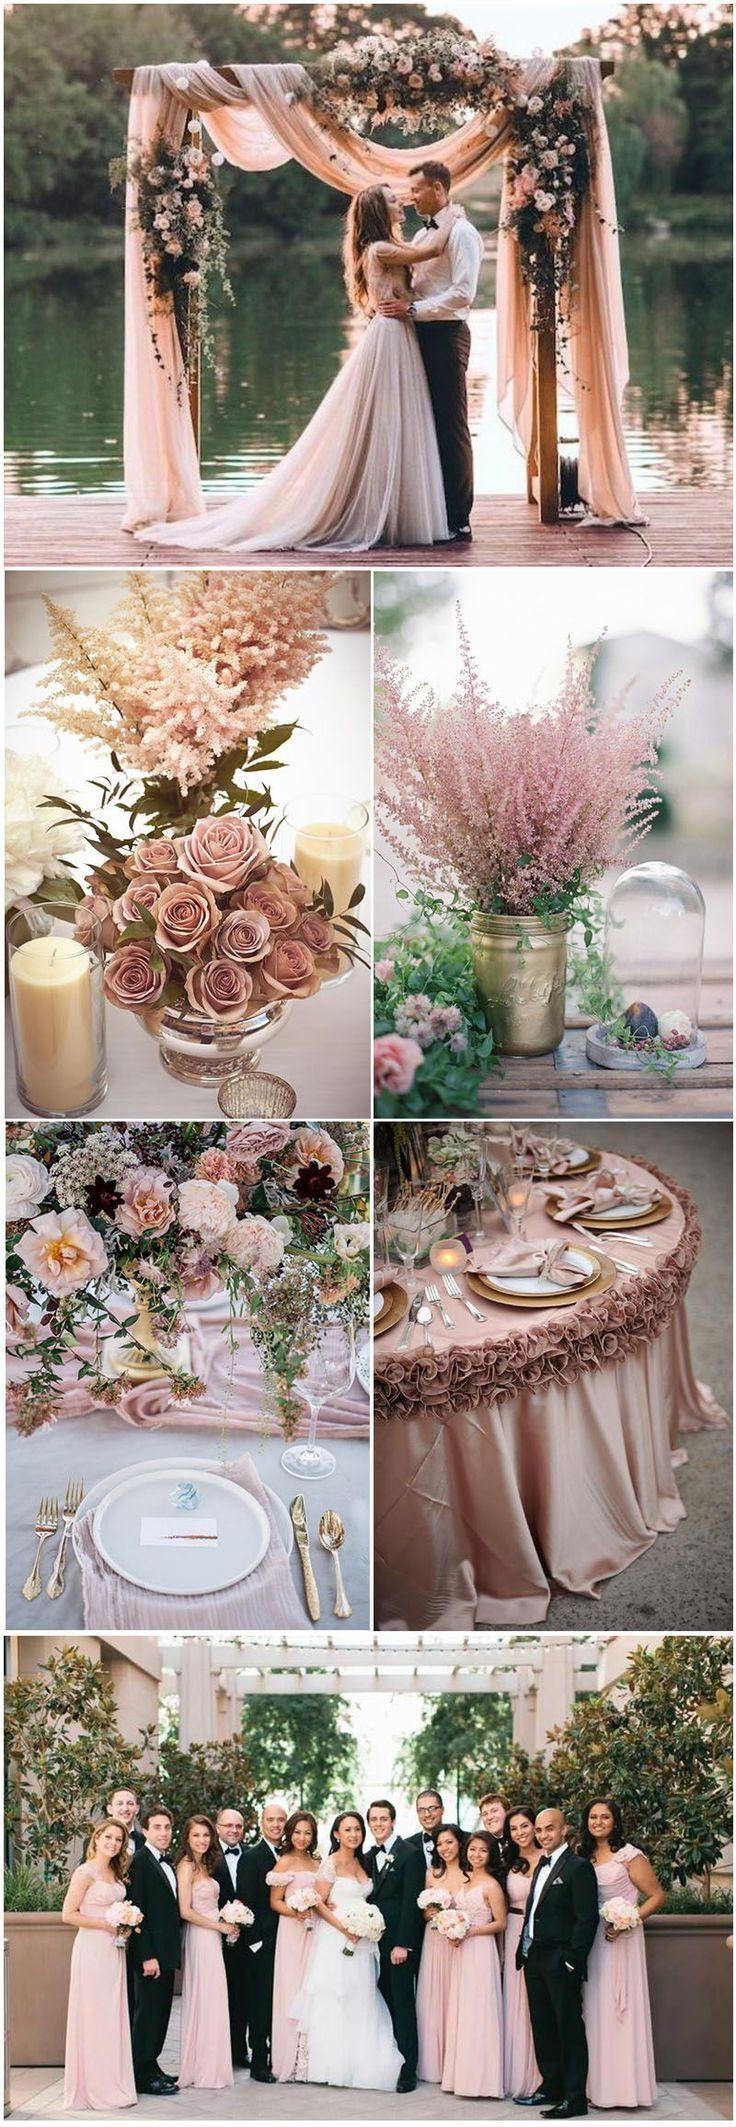 18 Romantic Dusty Rose Wedding Color Ideas for 2019 Weddings 3fa4ddfd2e8d76f5573fc155af1df7d8